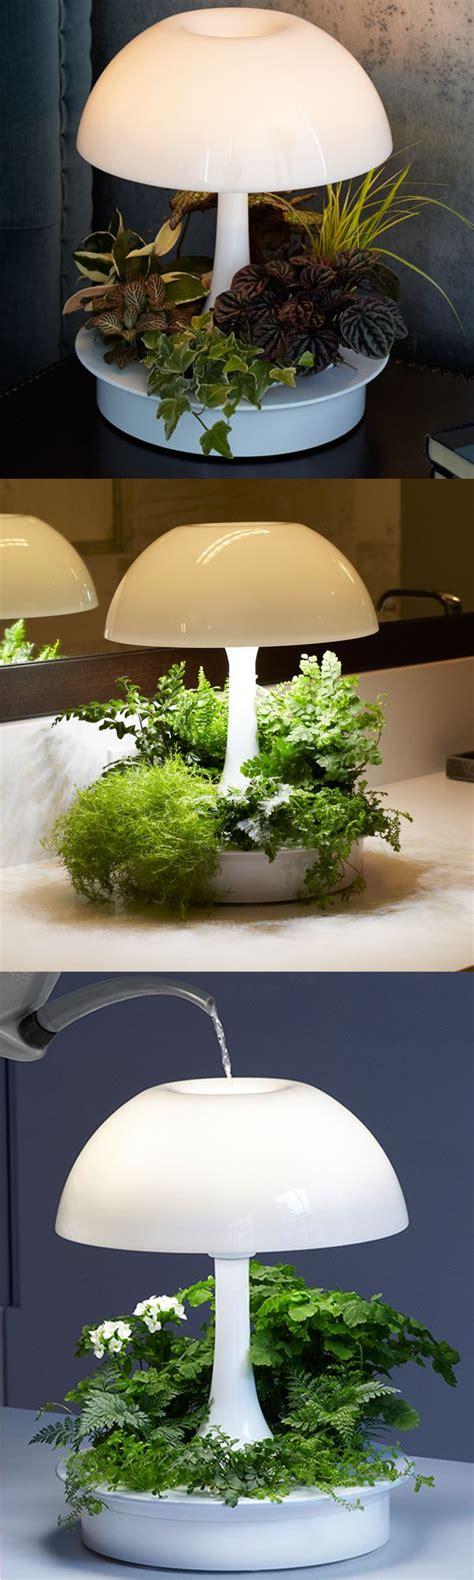 t5 grow lights for indoor plants best 25 grow lights ideas on grow lights for